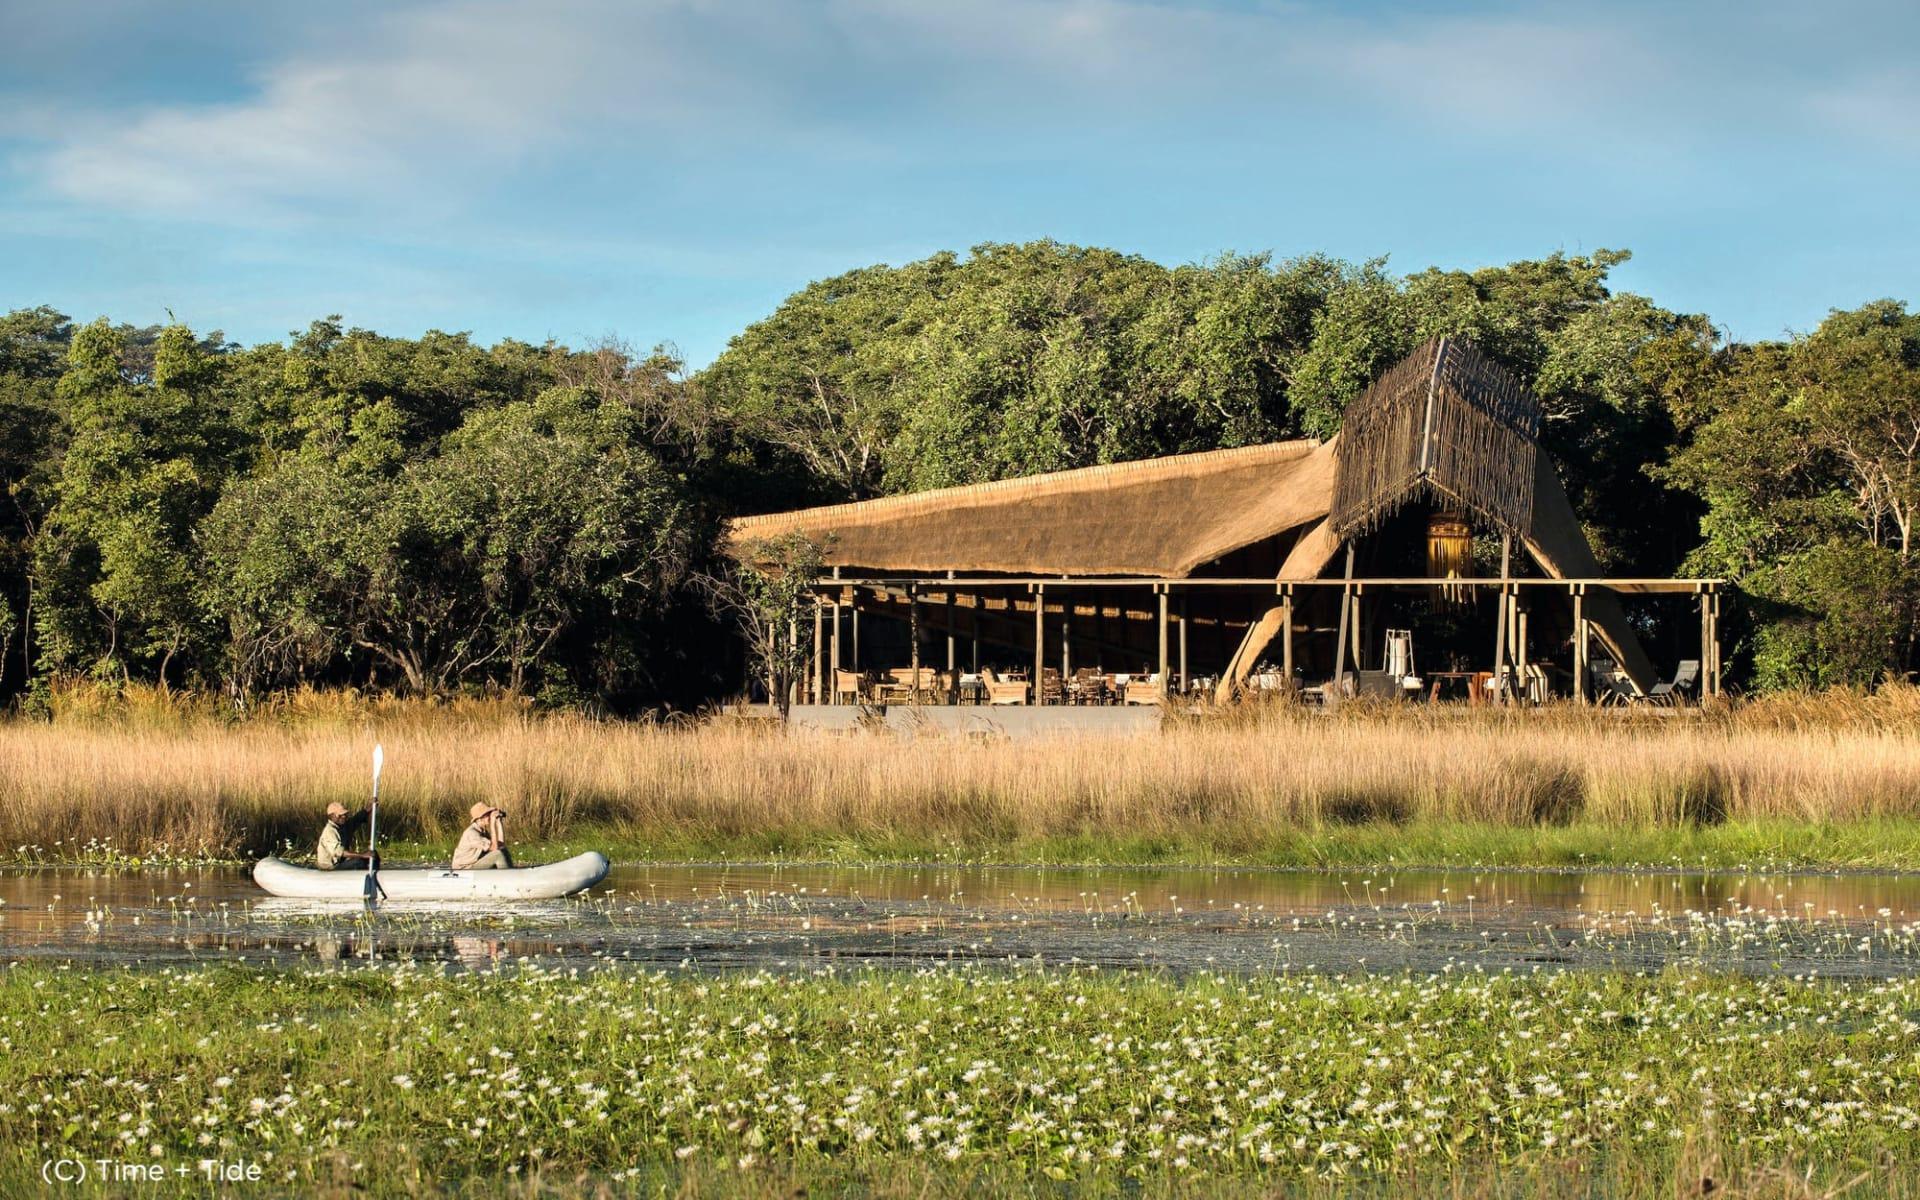 King Lewanika Lodge in Liuwa Plain:  King Lewanika - Mokoro Tour c Time+Tide